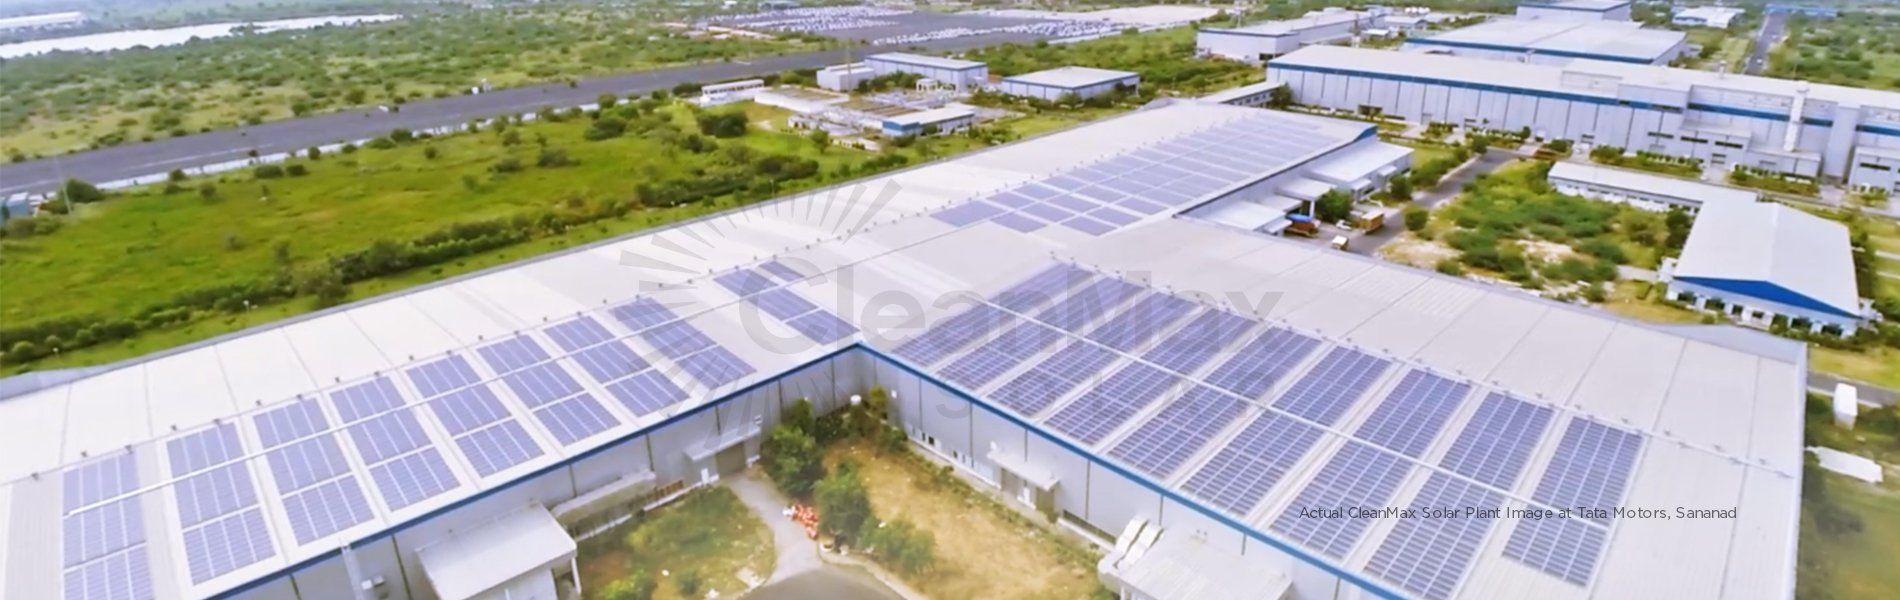 IIT BHU Rooftop Solar Power Plant